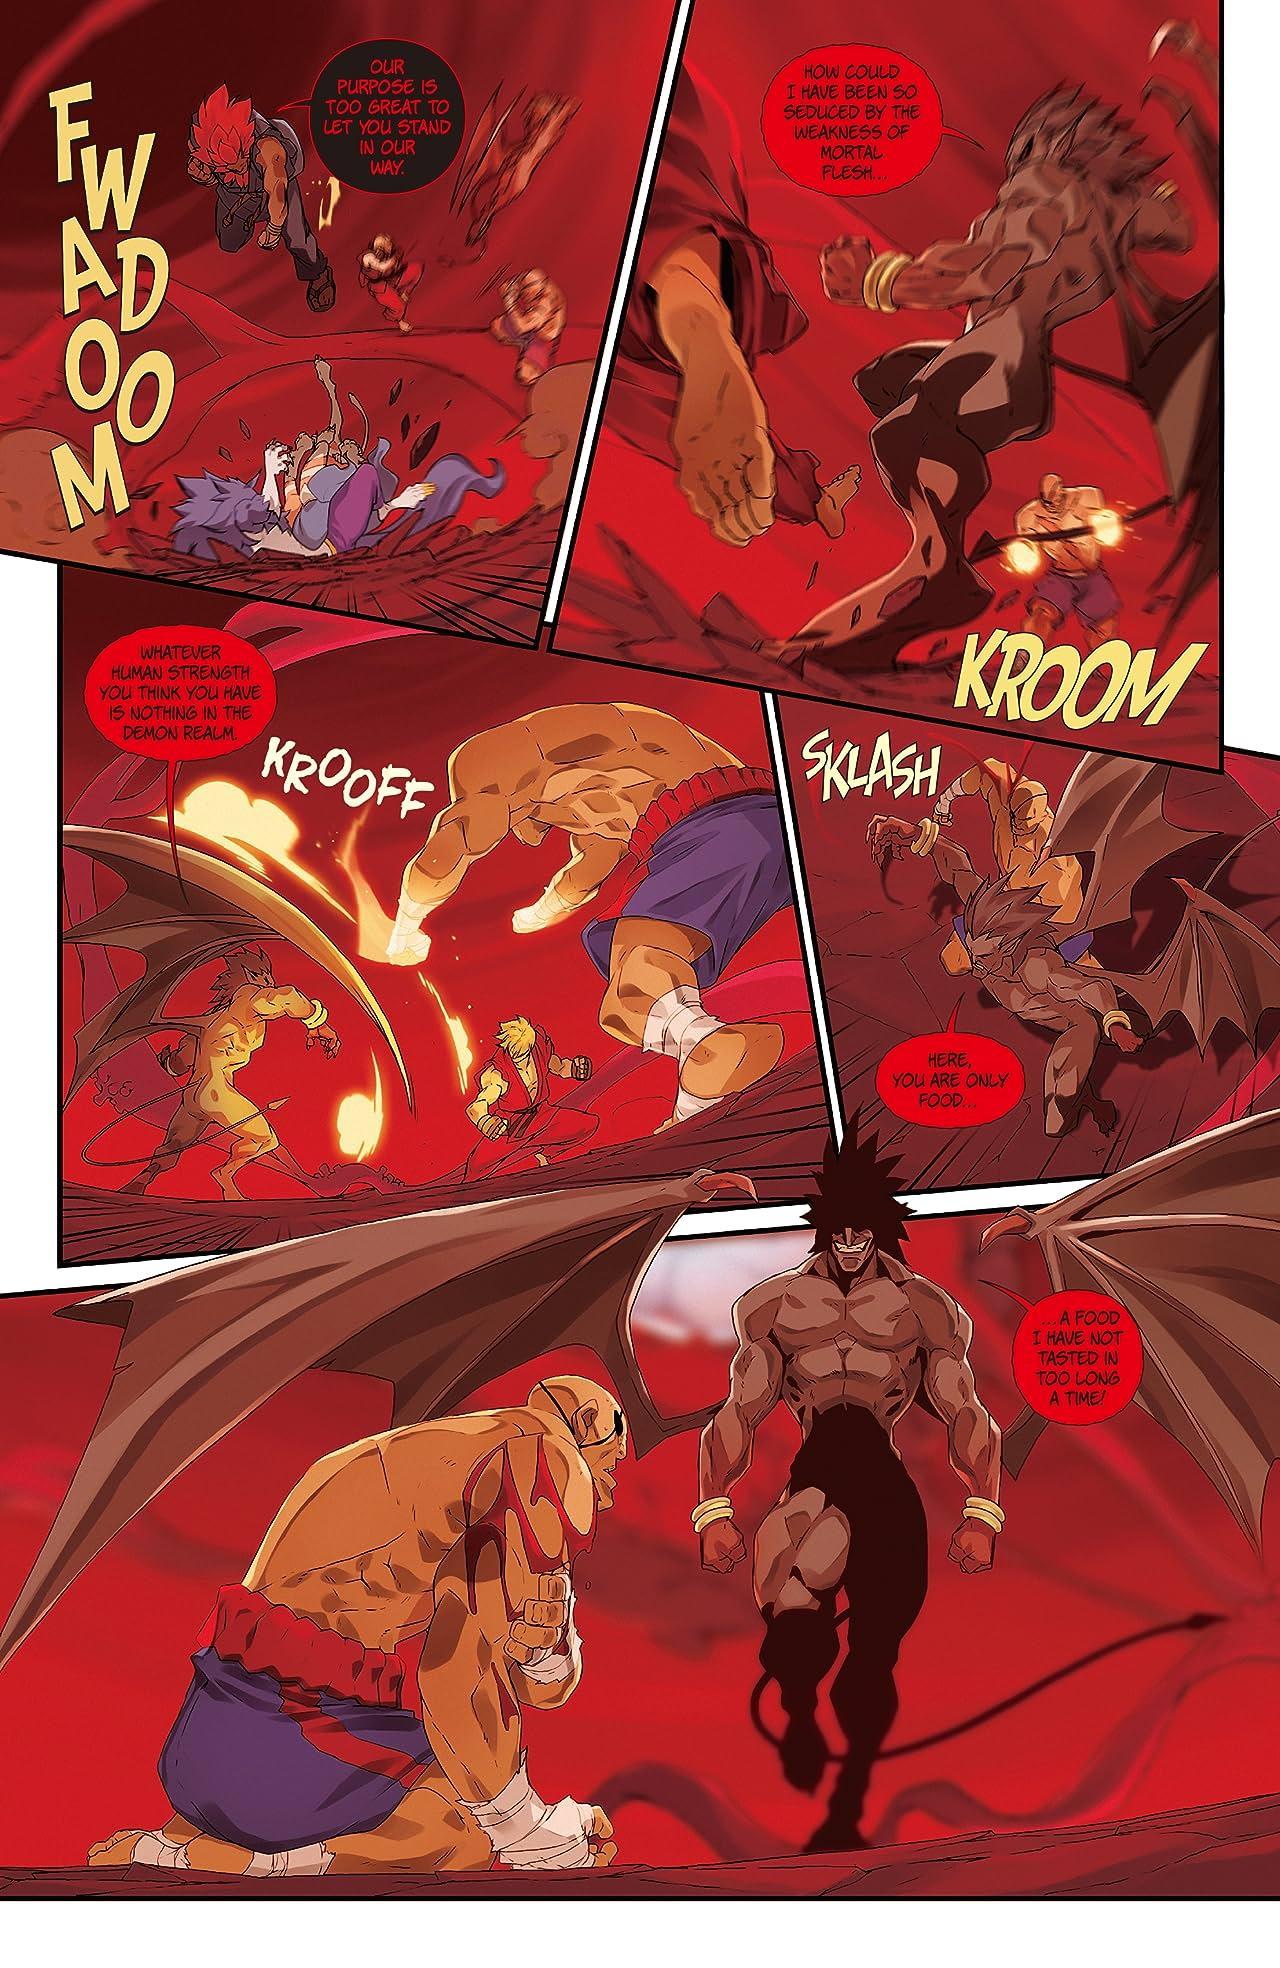 Street Fighter VS Darkstalkers #7 (of 8)